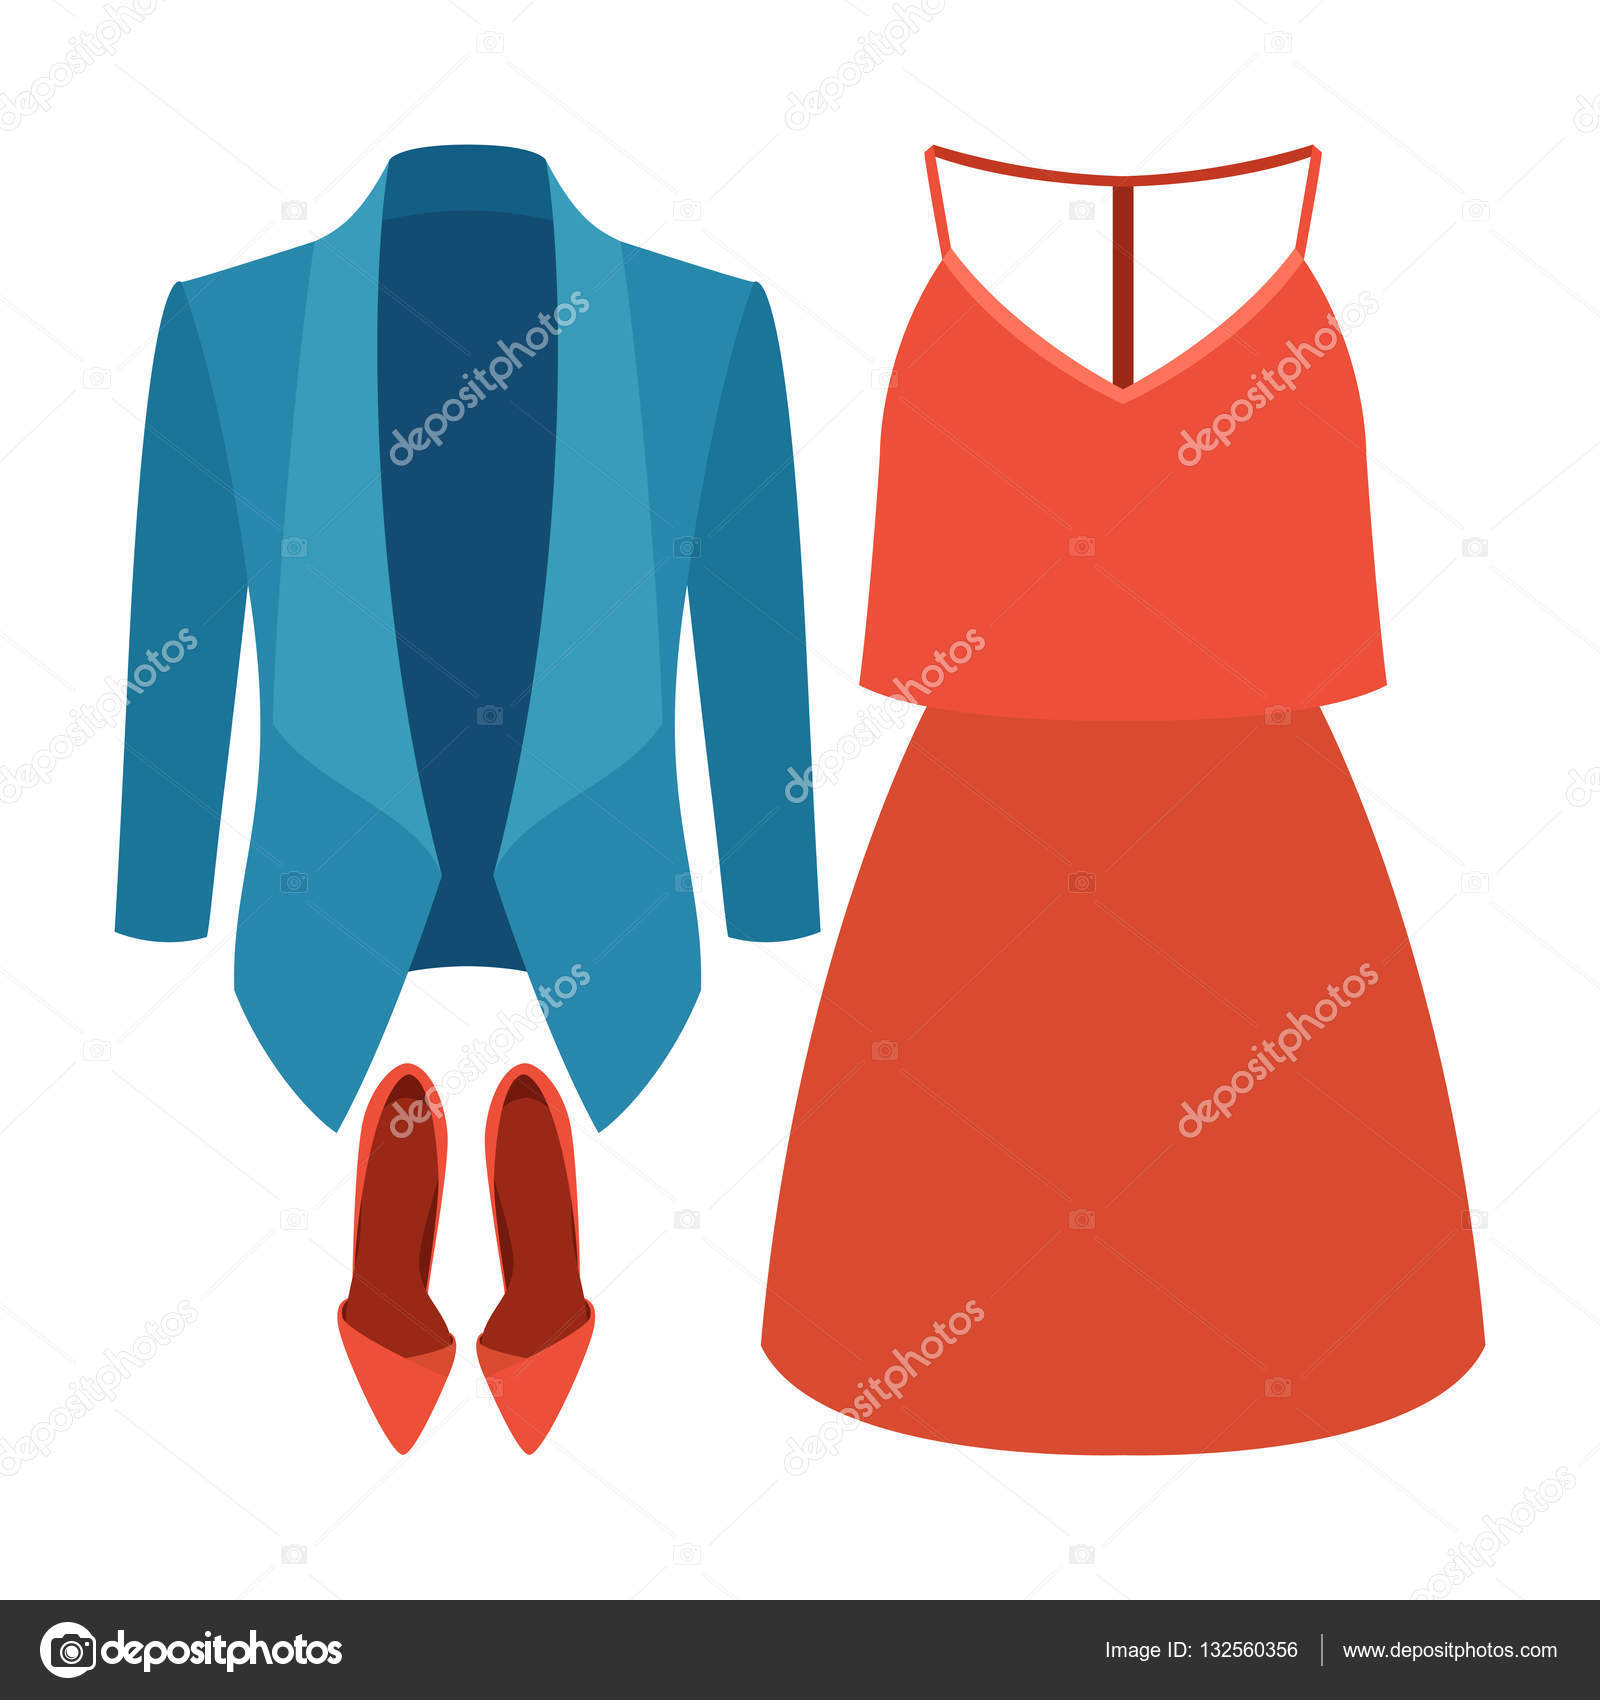 dd156099a Sada oblečení trendy Dámské sako, šaty a doplňky. Vektorové ilustrace —  Vektor od ...